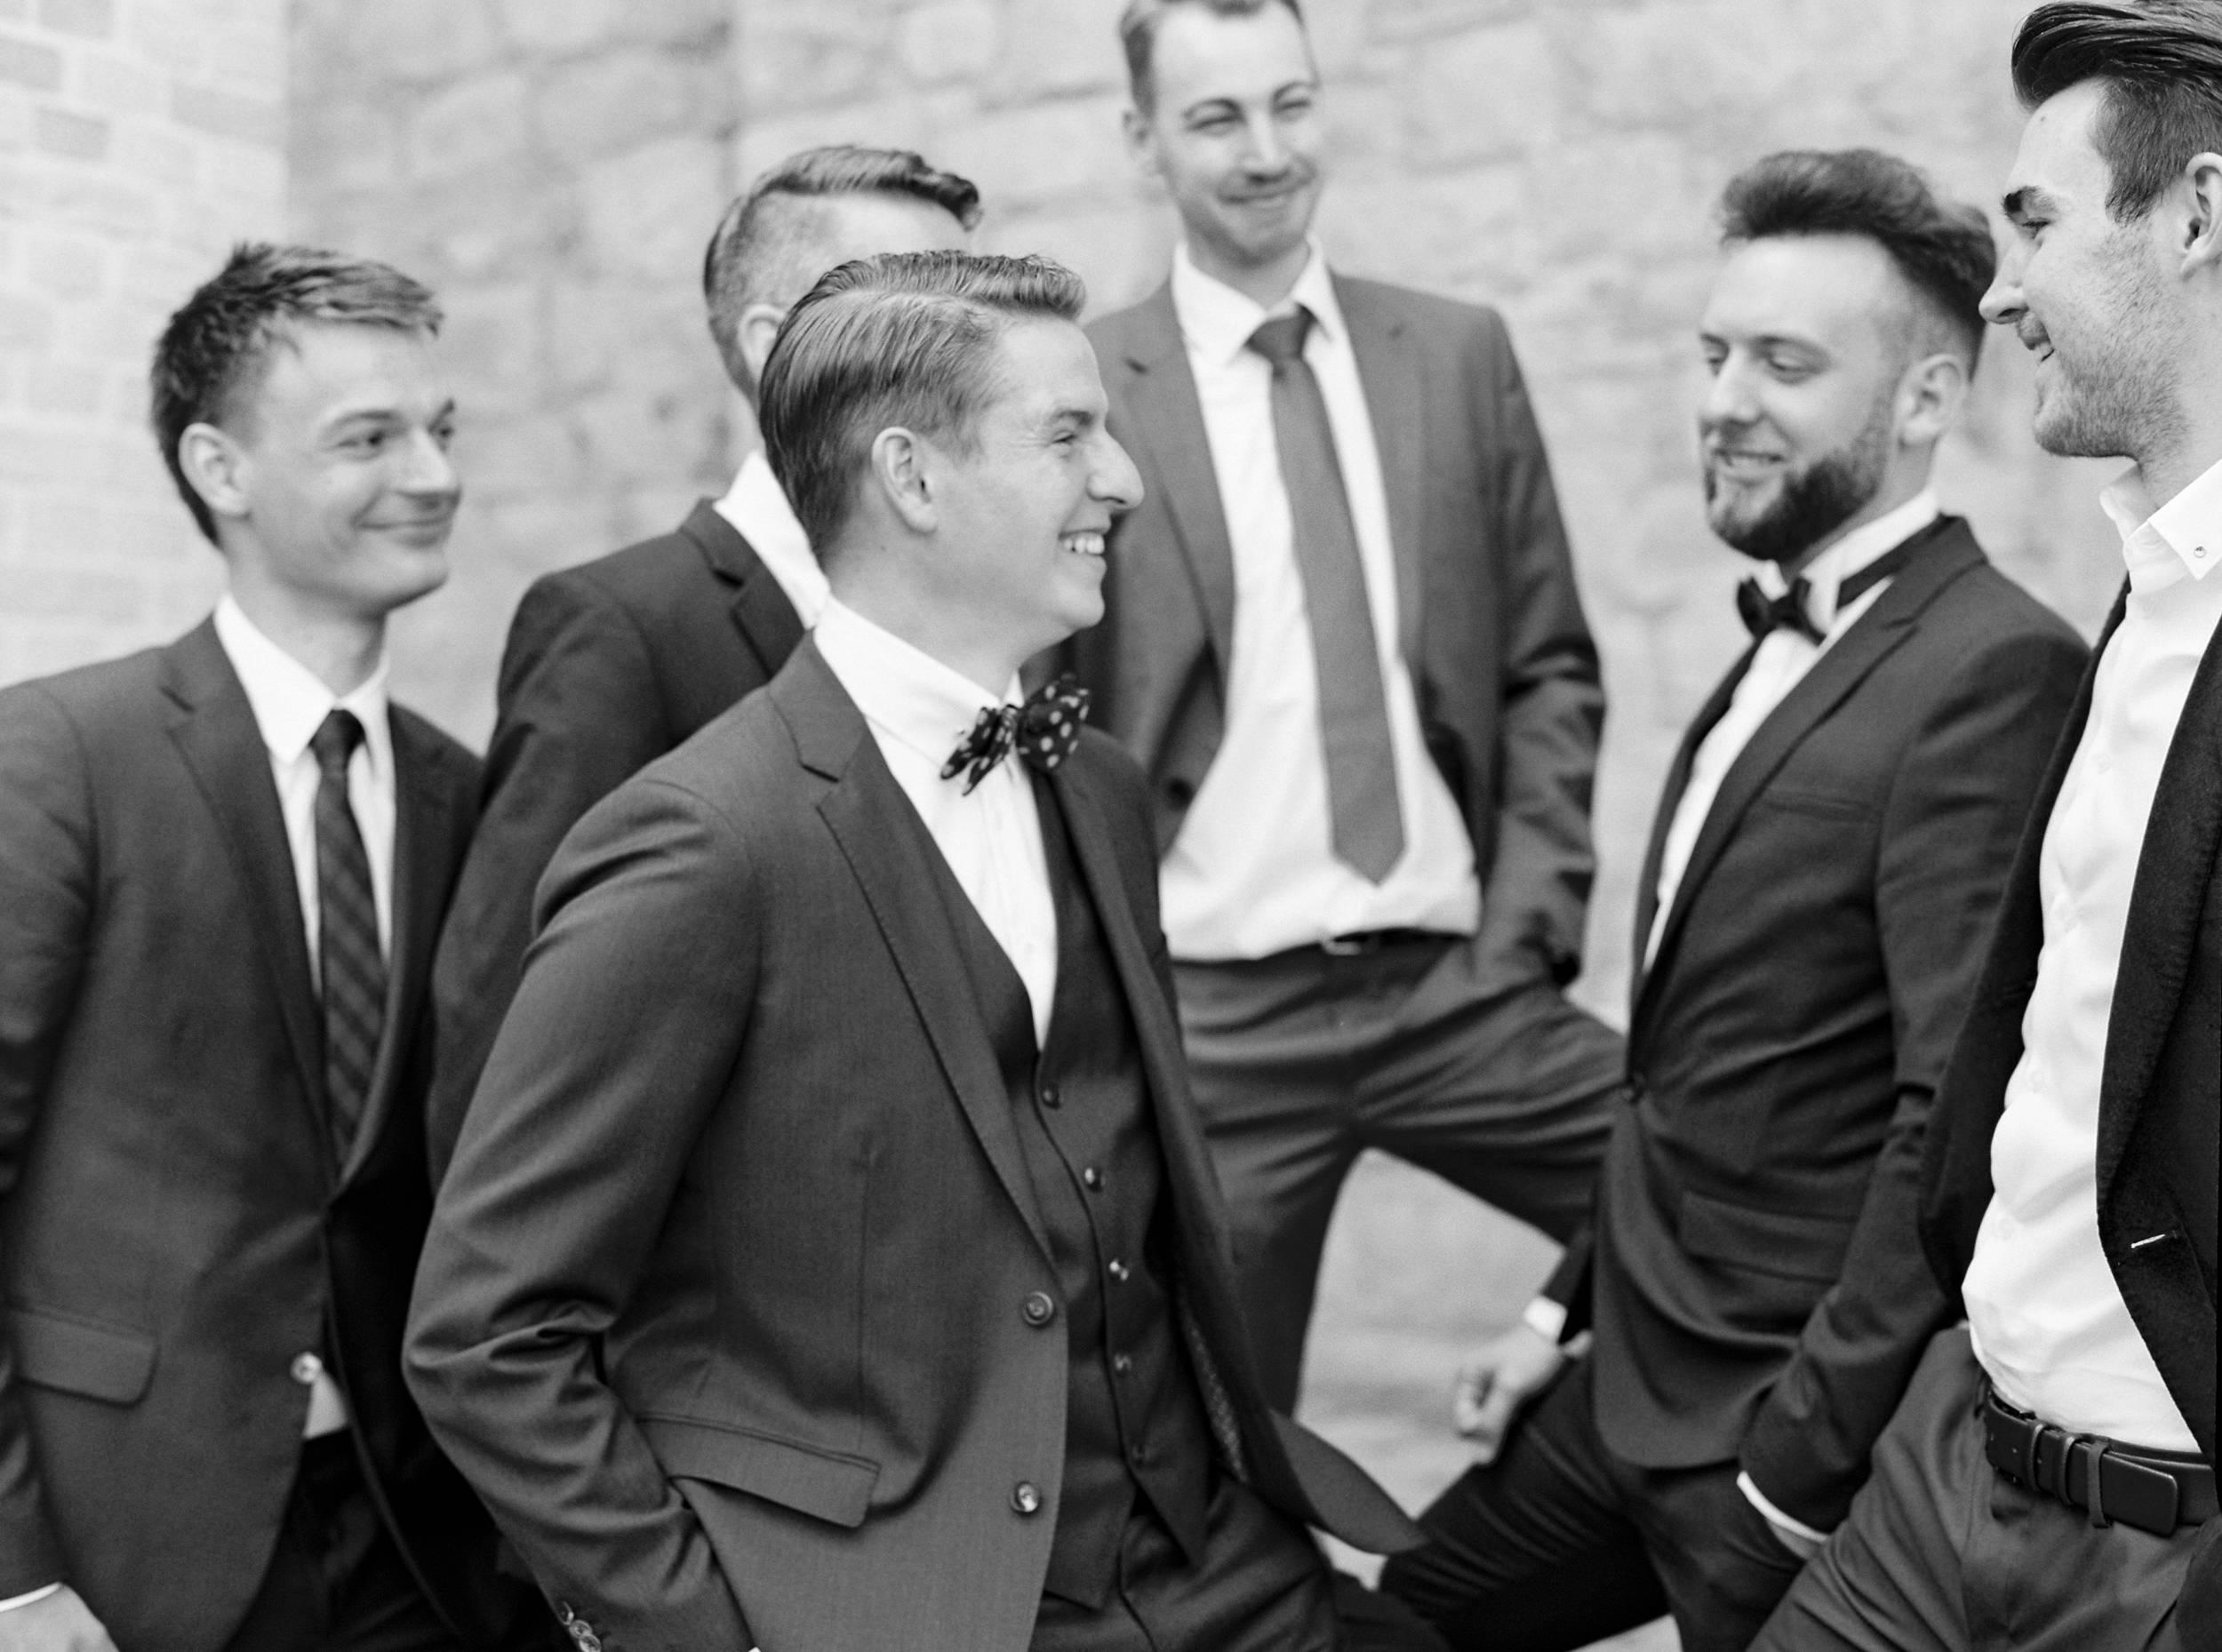 groom groomsmen happy laughing bräutigam trauzeugen jungs männer lachen